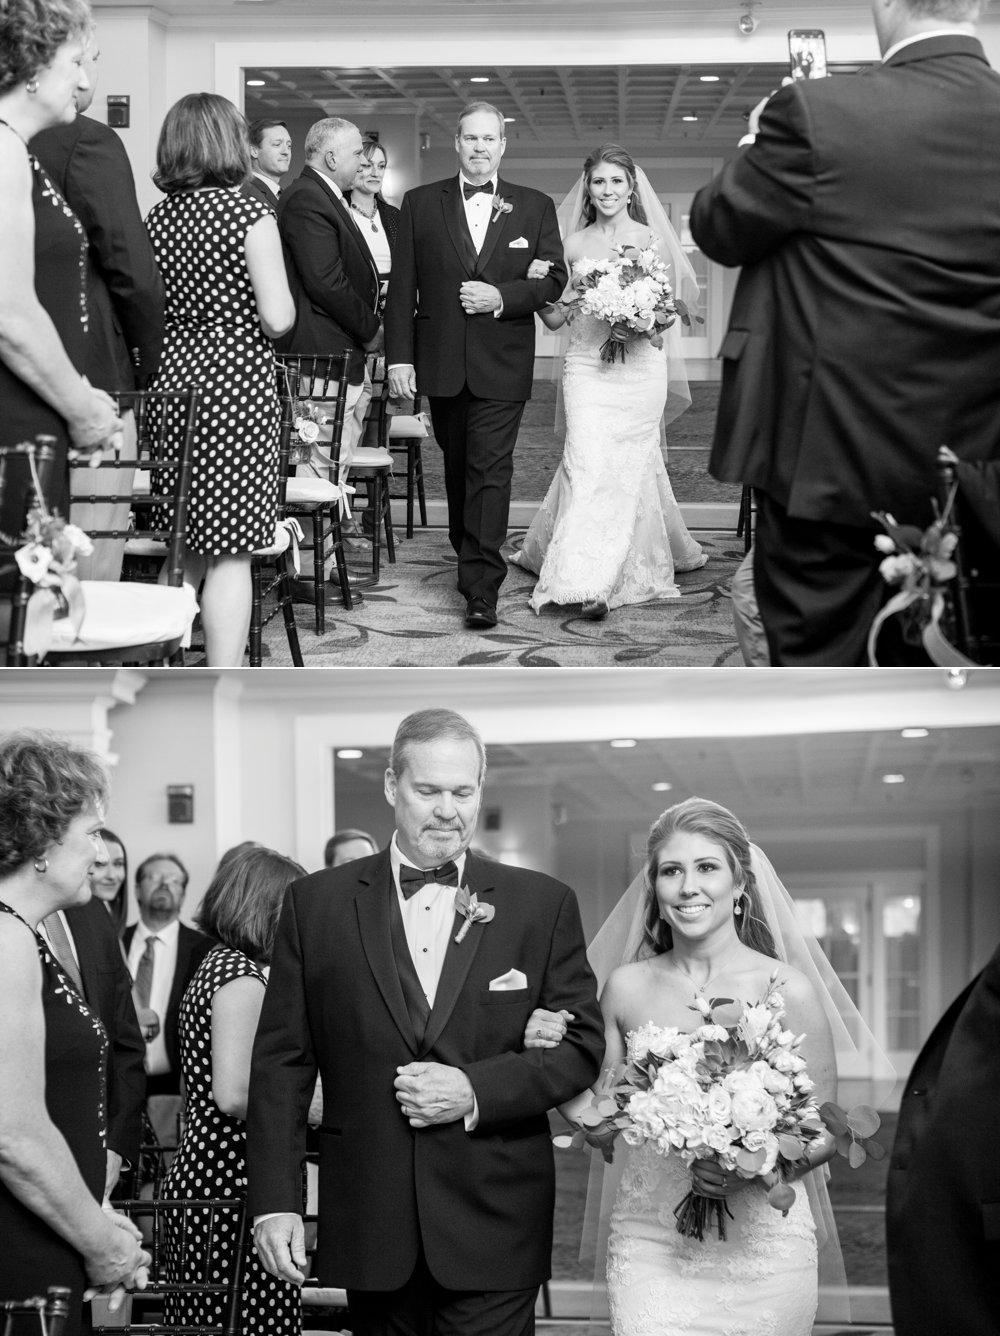 SomerbyJonesPhotography_EquinoxVermont_Wedding_0021.jpg